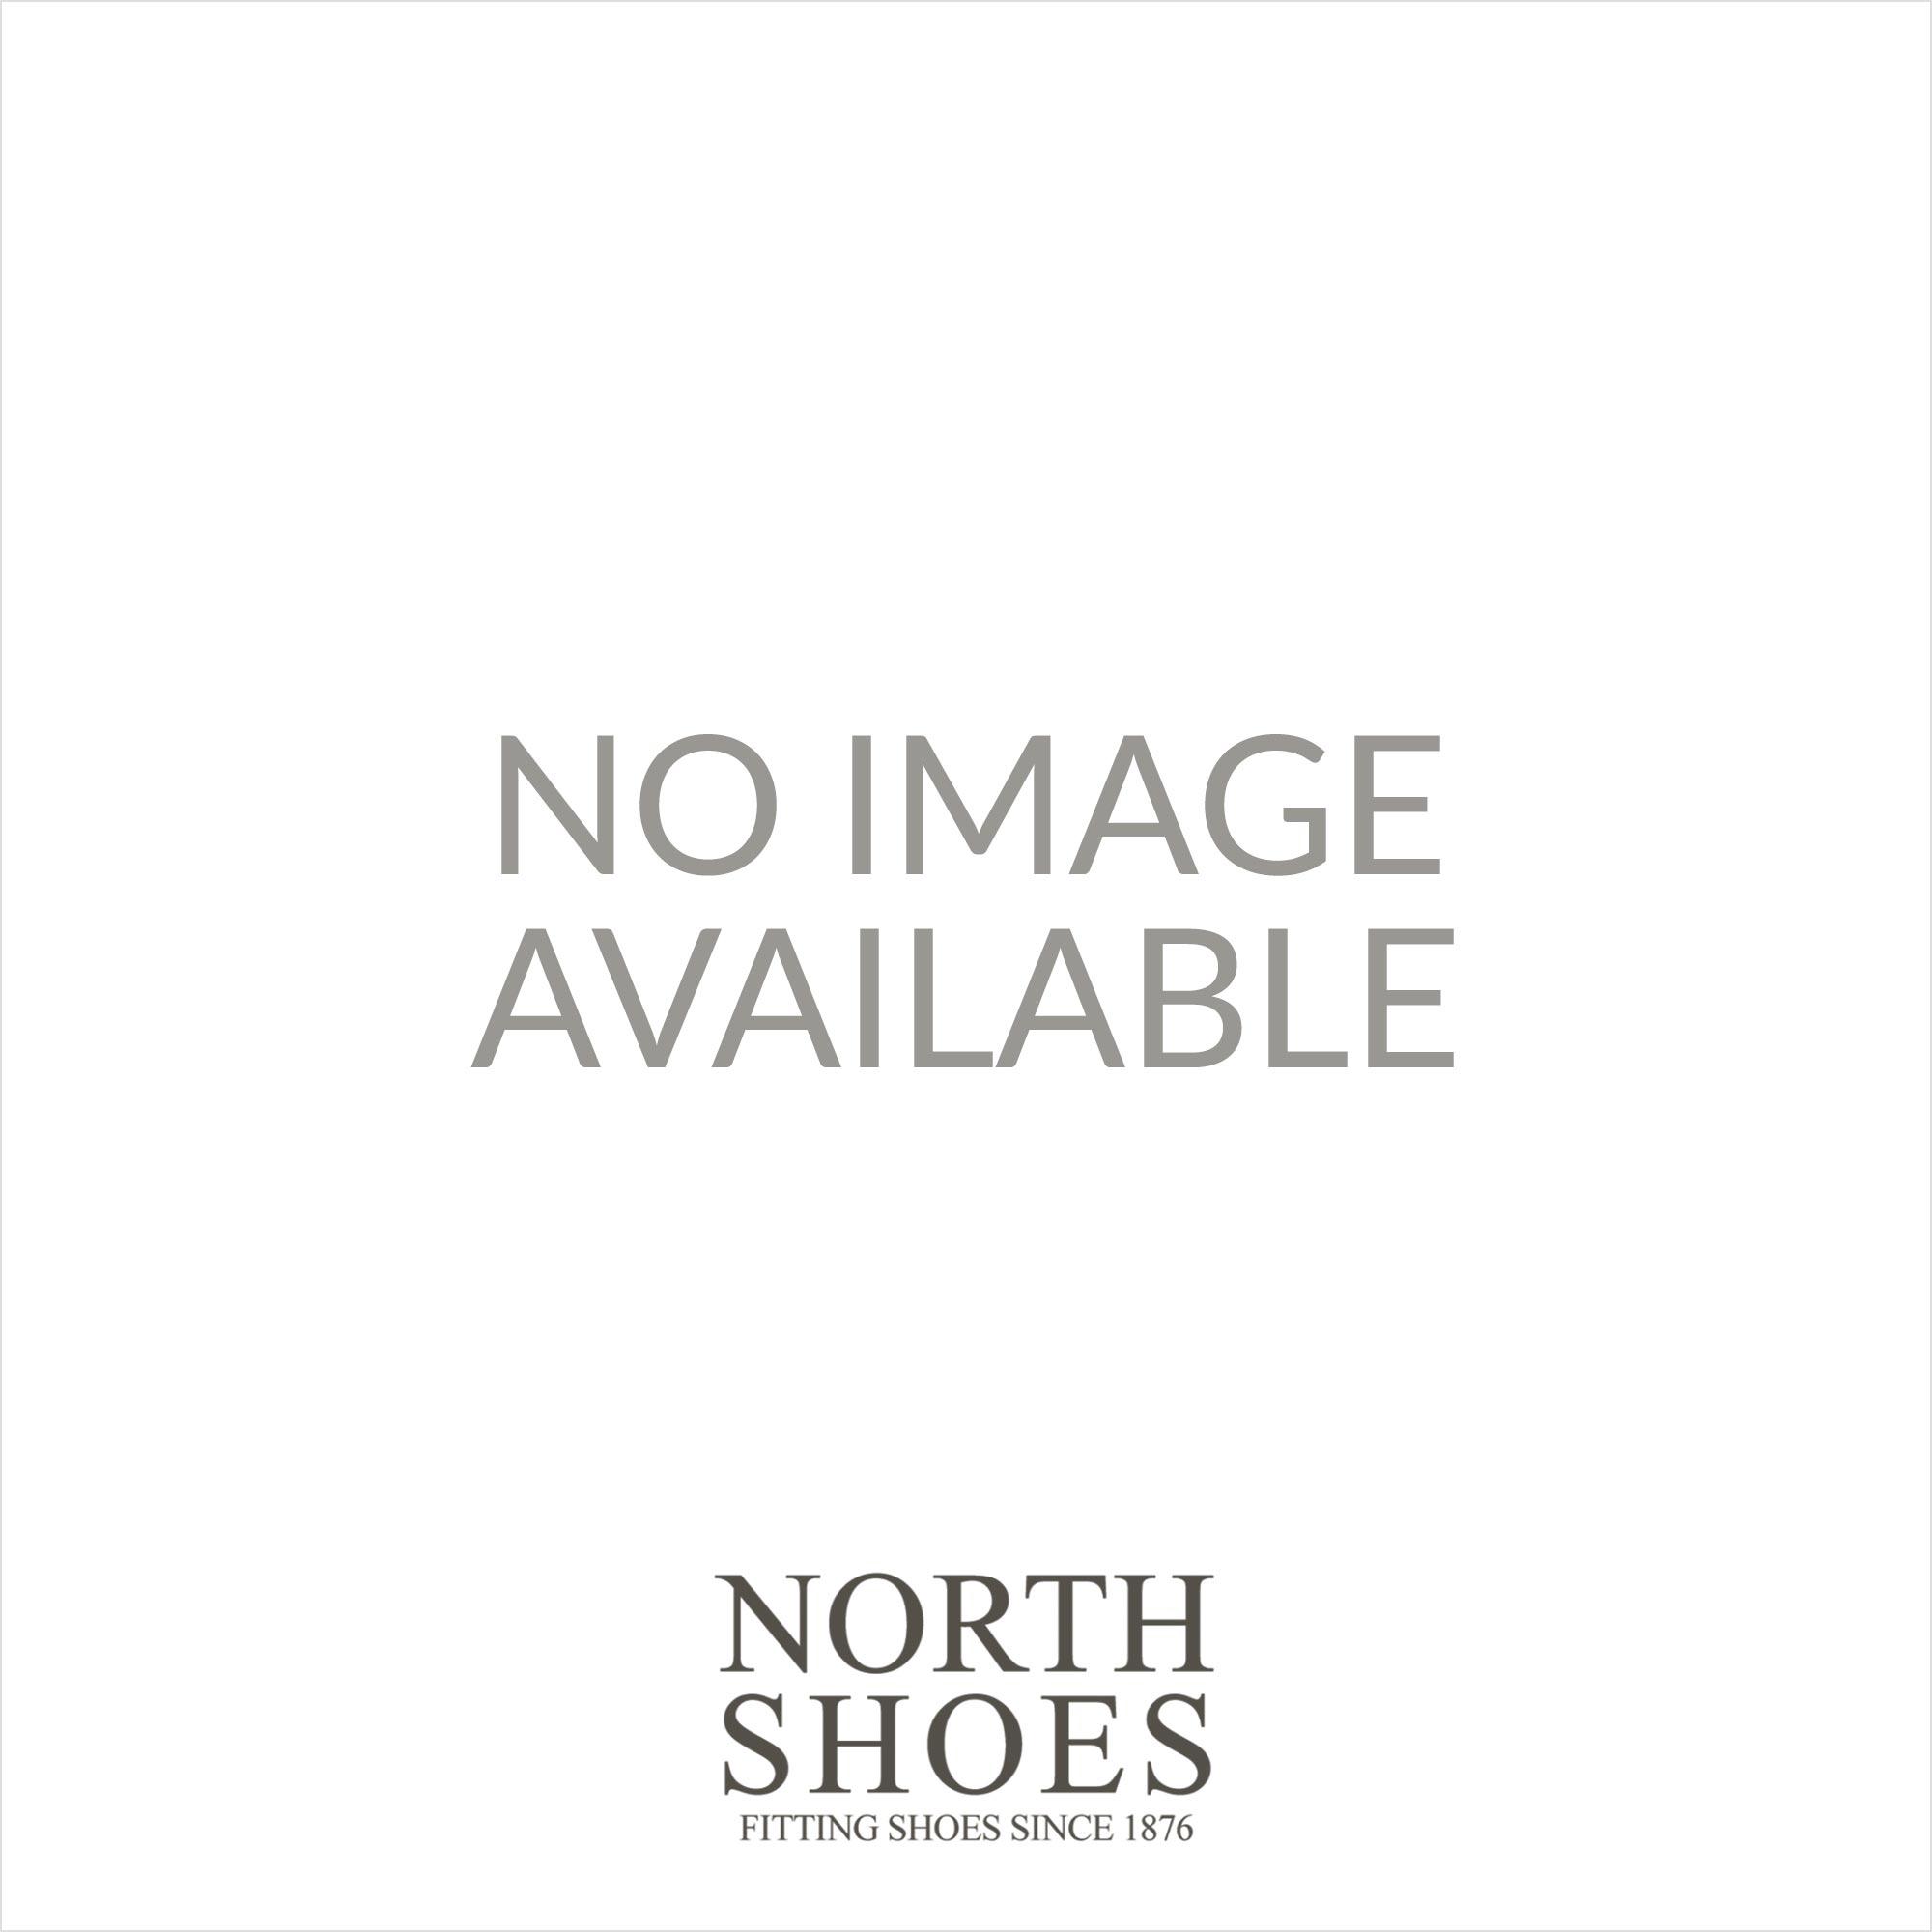 b9bb28b4773e Skechers 14681 Blue Rubber Womens Toe Post Flip Flop Sandal ...